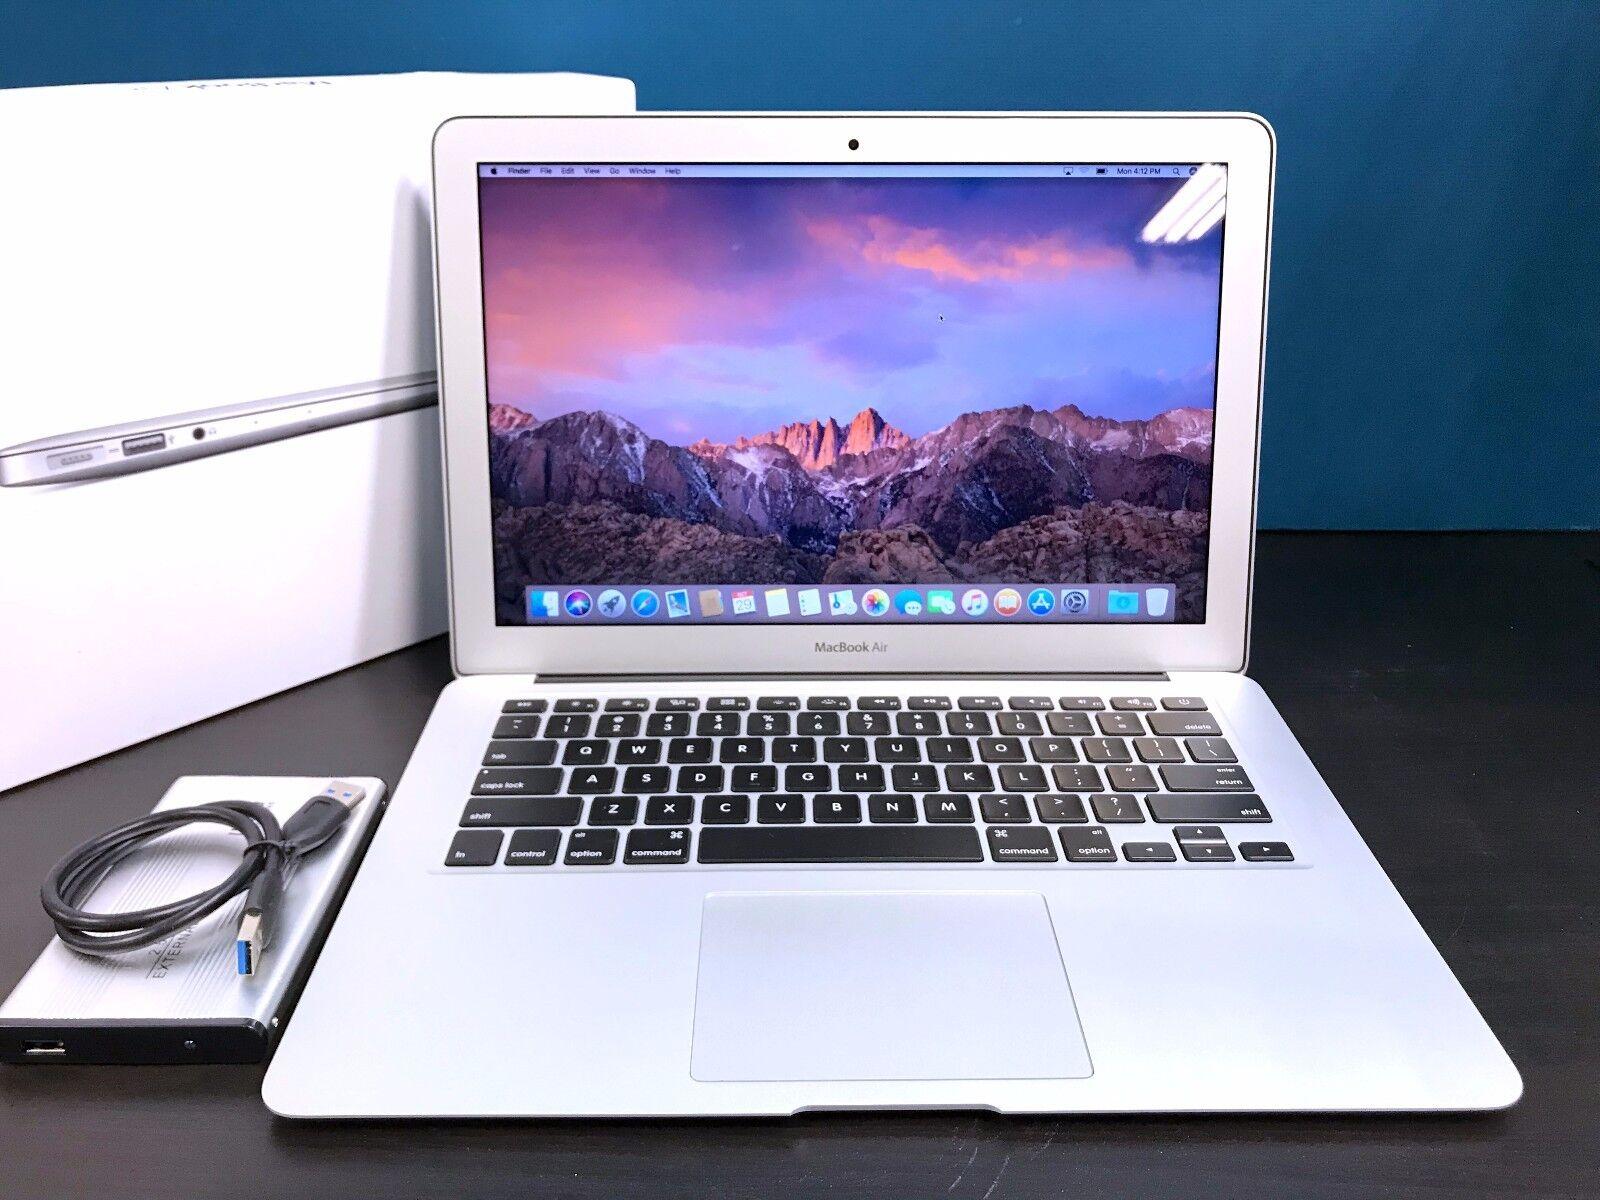 "APPLE MacBook Air 13"" / 2.8GHz CORE i5 TURBO / 4GB RAM / 512GB+ SSD / OS-2017"